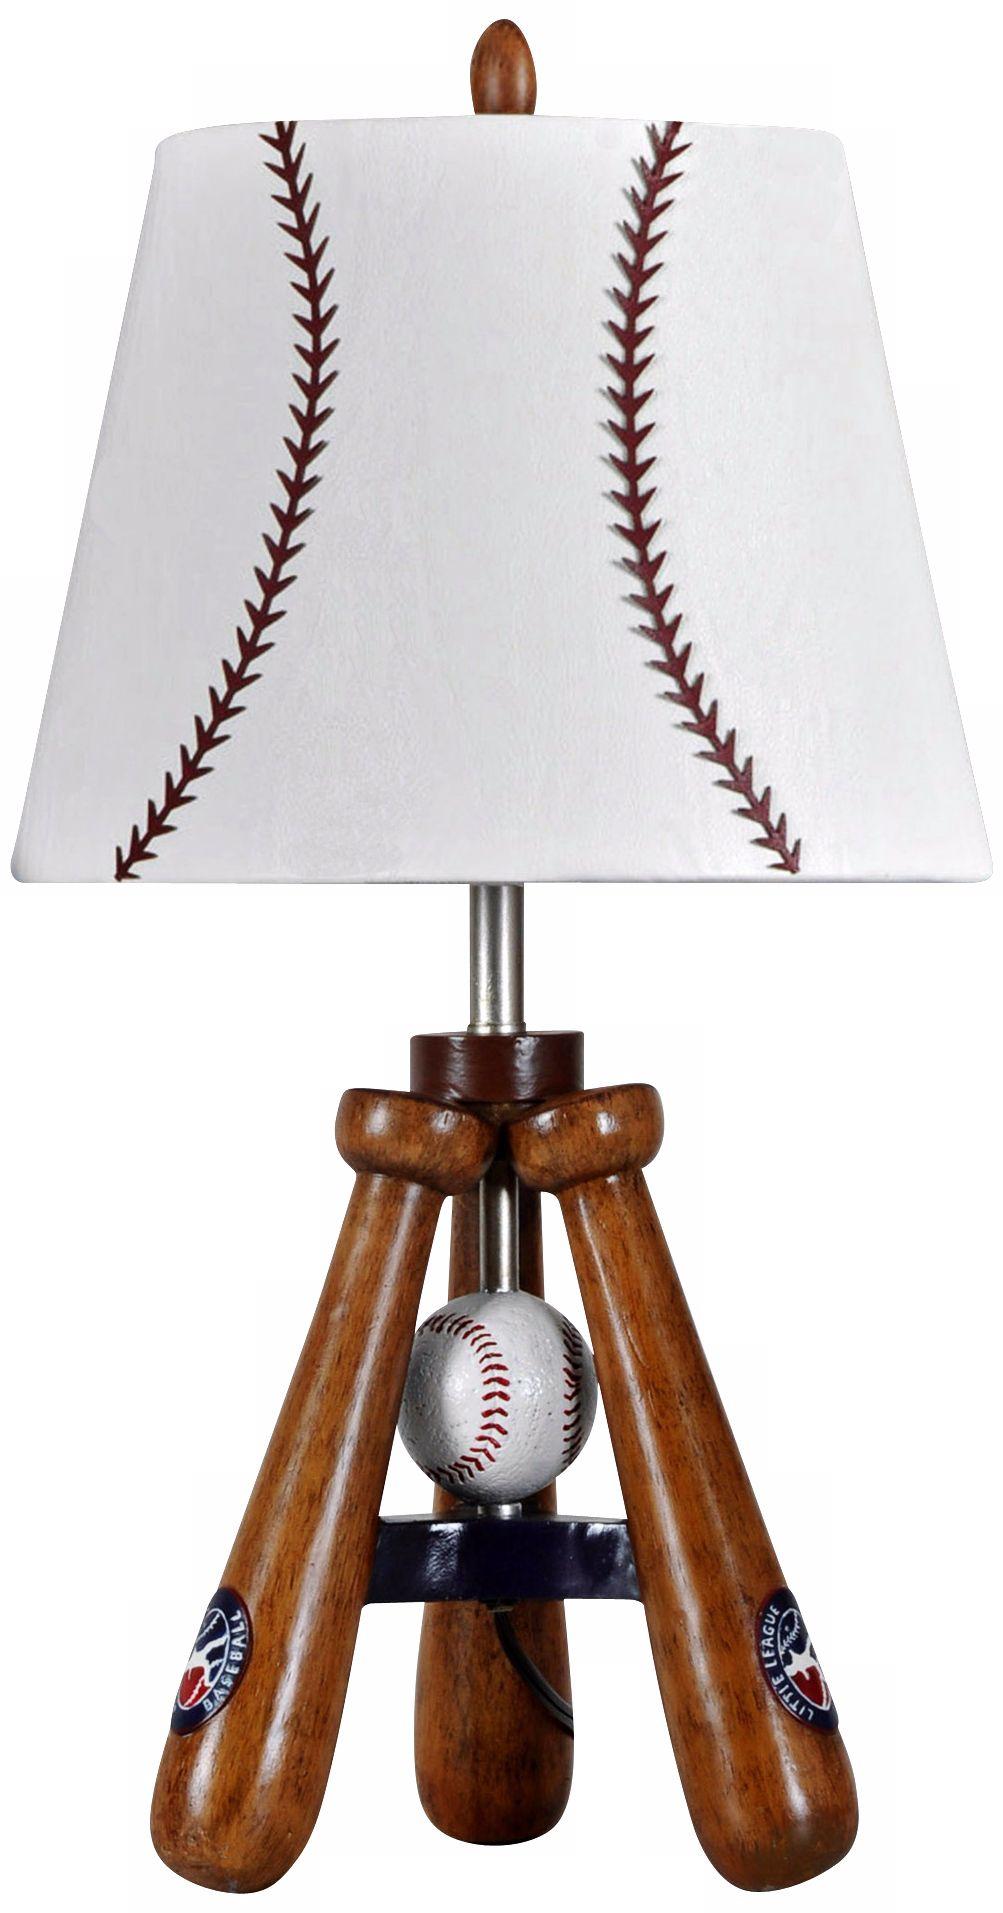 Kidd Valley Baseball Bat And Ball Tripod Accent Lamp